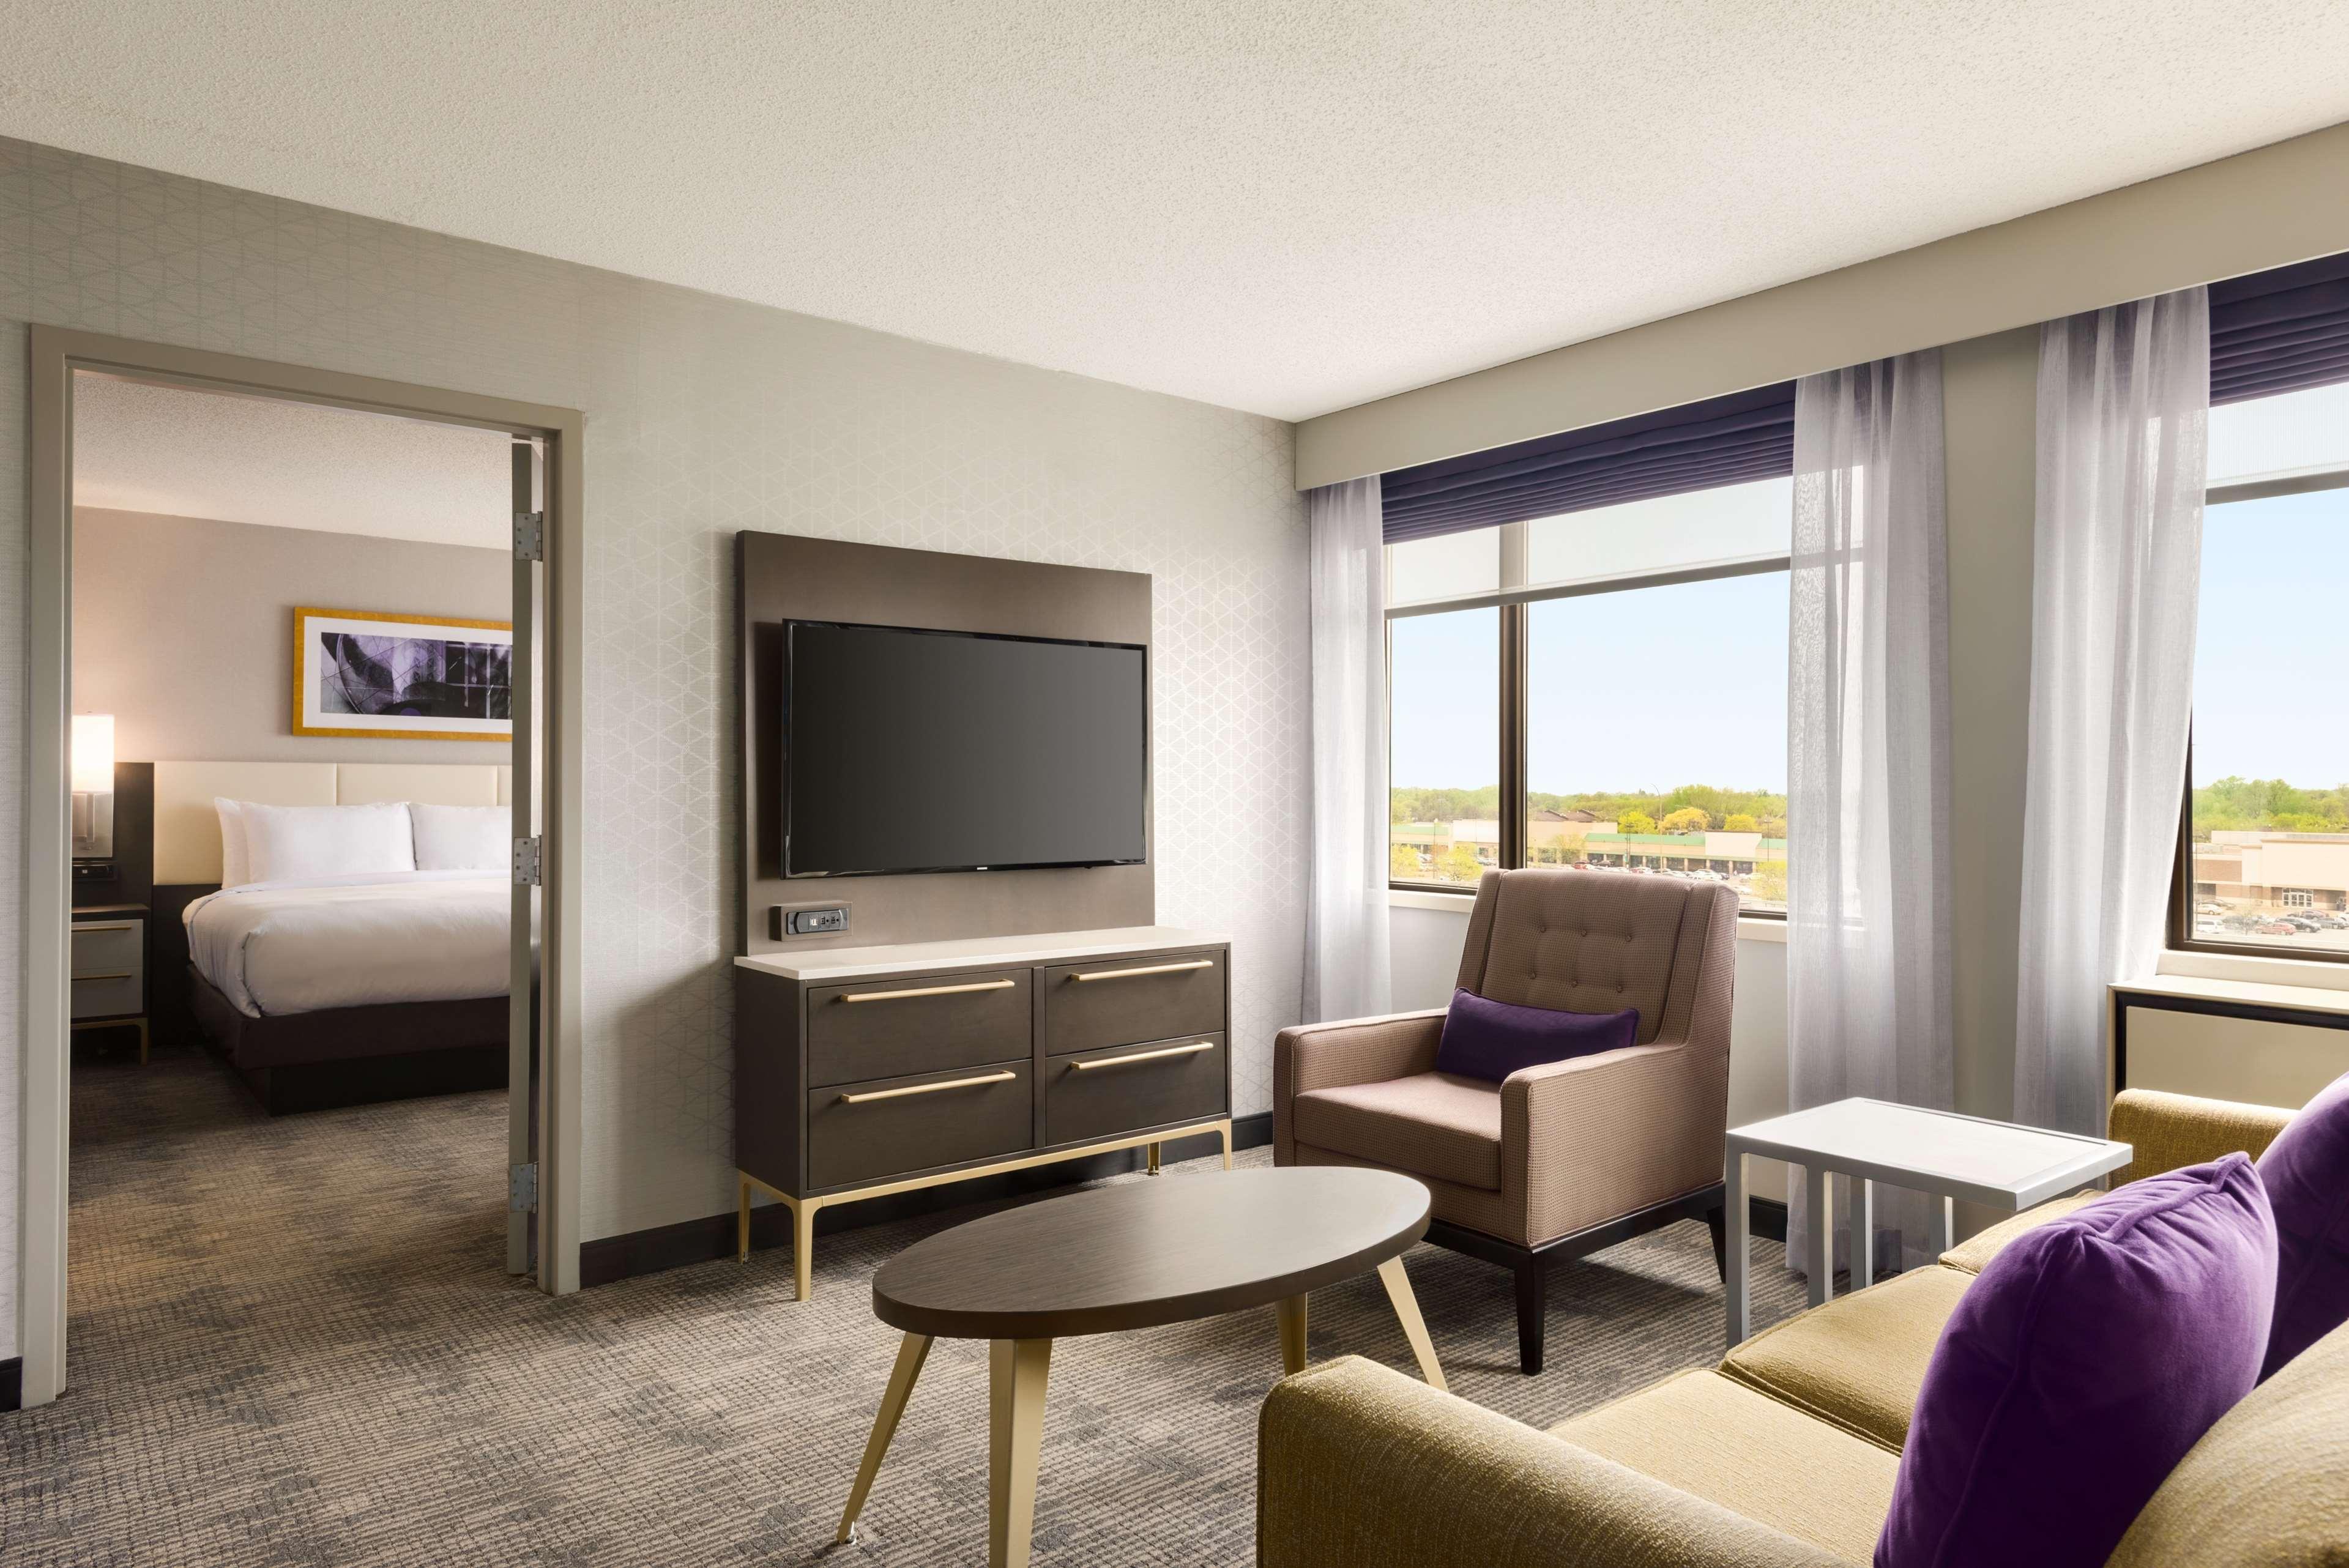 DoubleTree by Hilton St. Paul East image 21